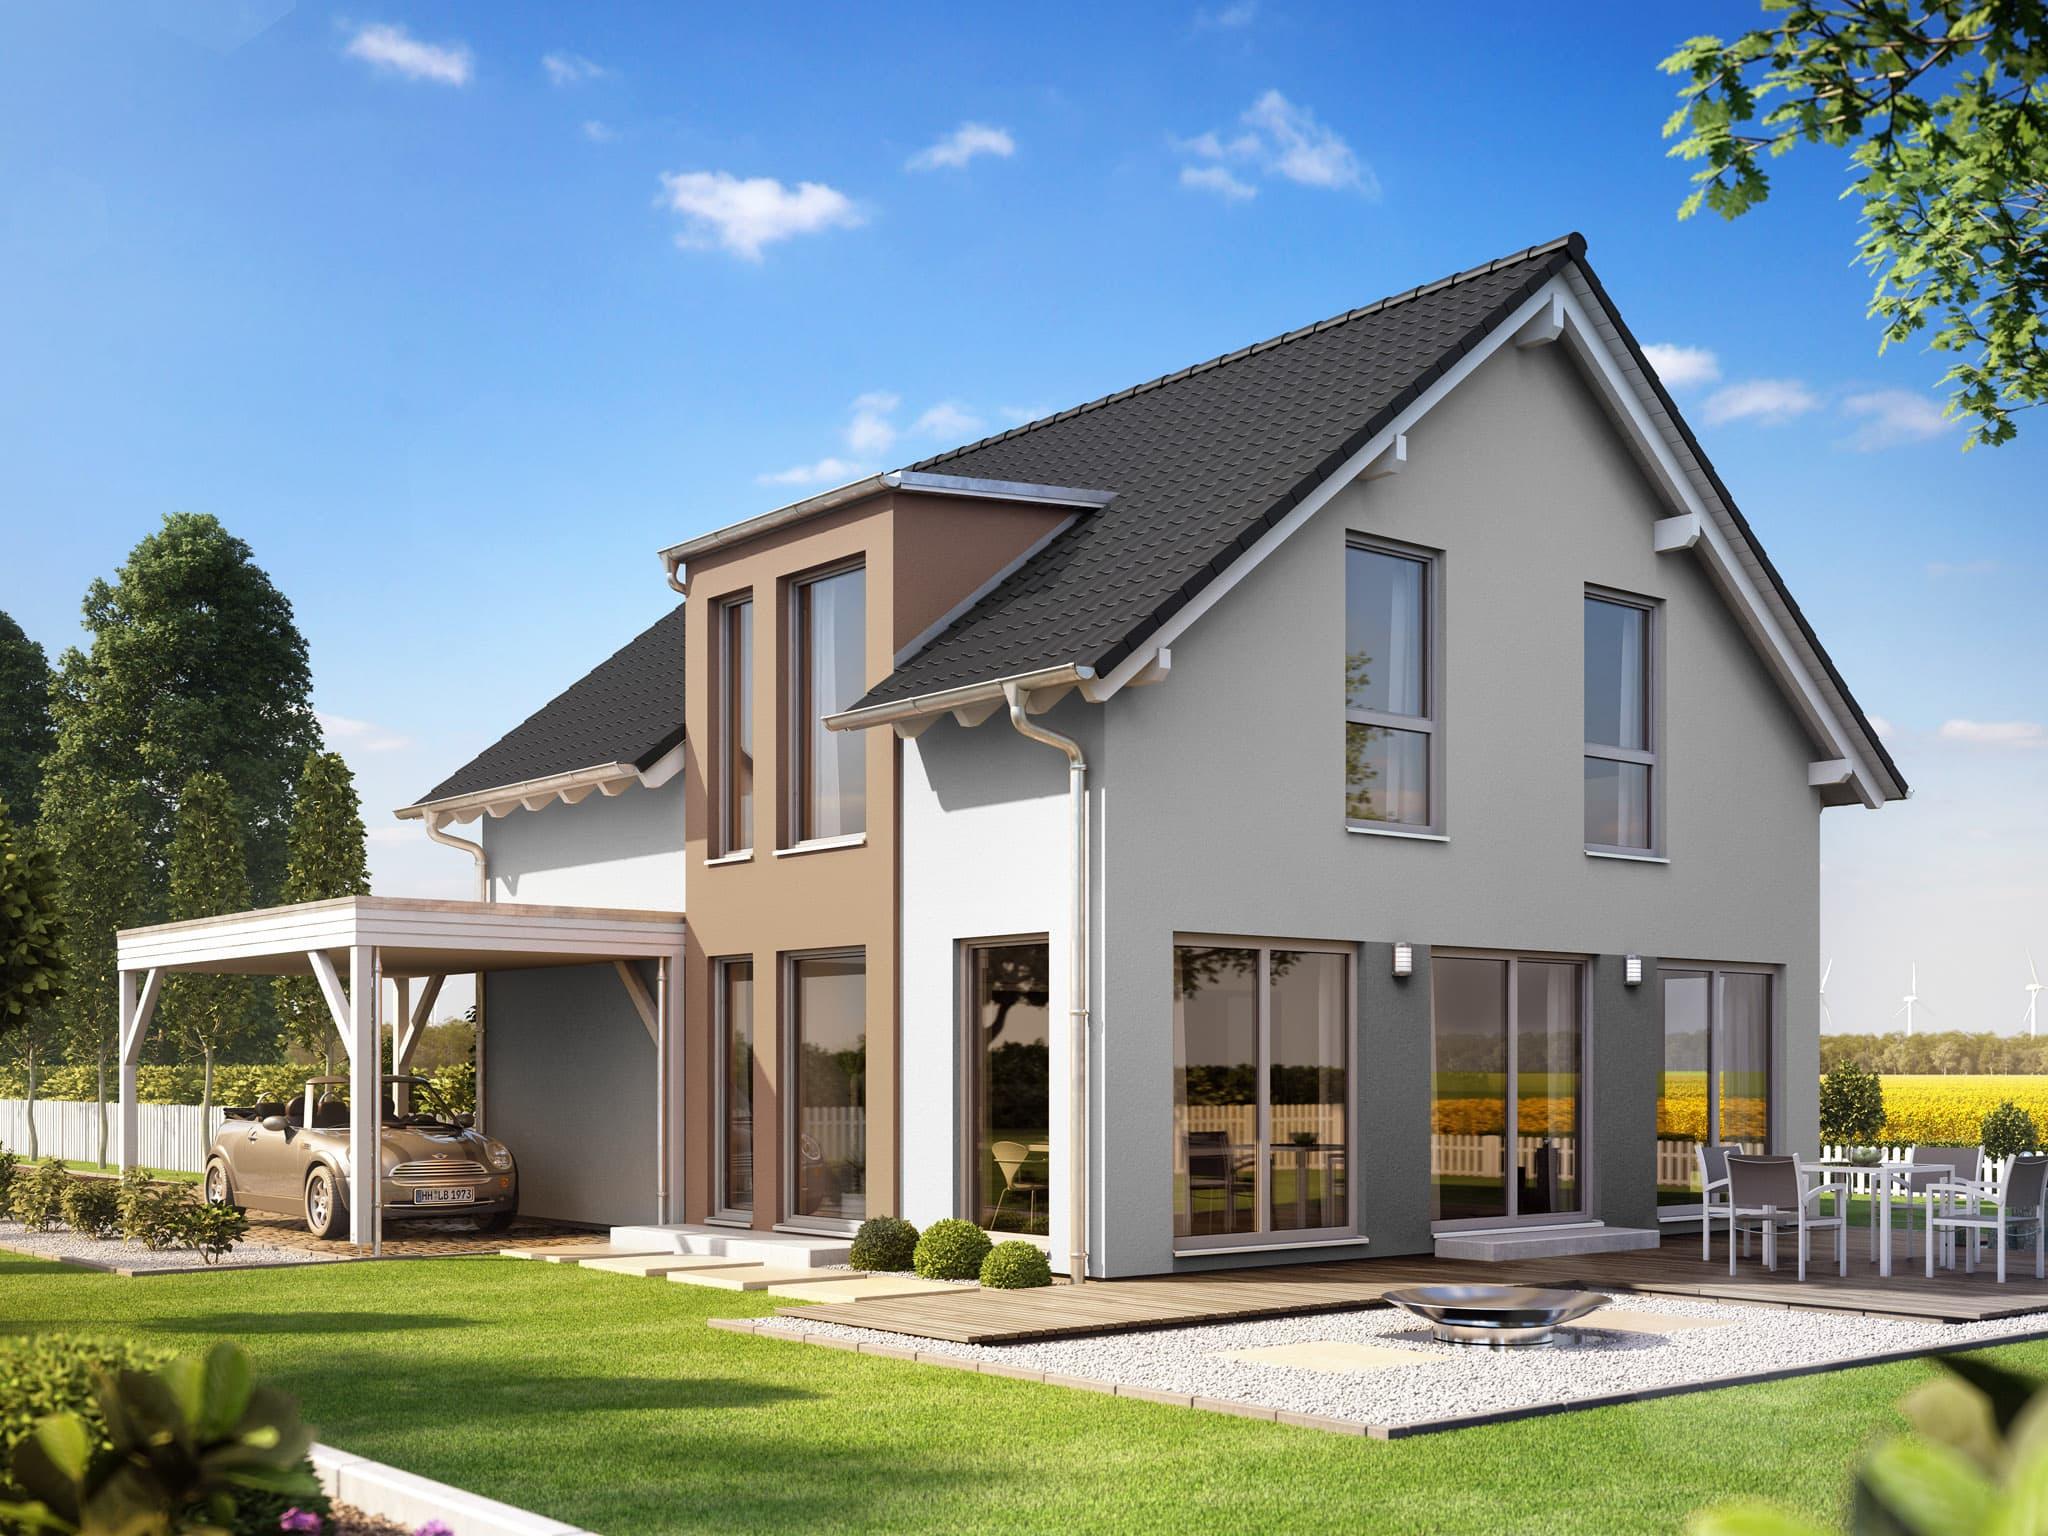 Fertighaus mit Satteldach & Carport, 5 Zimmer, 135 qm - Haus bauen Ideen Einfamilienhaus Living Haus SUNSHINE 136 V2 b - HausbauDirekt.de